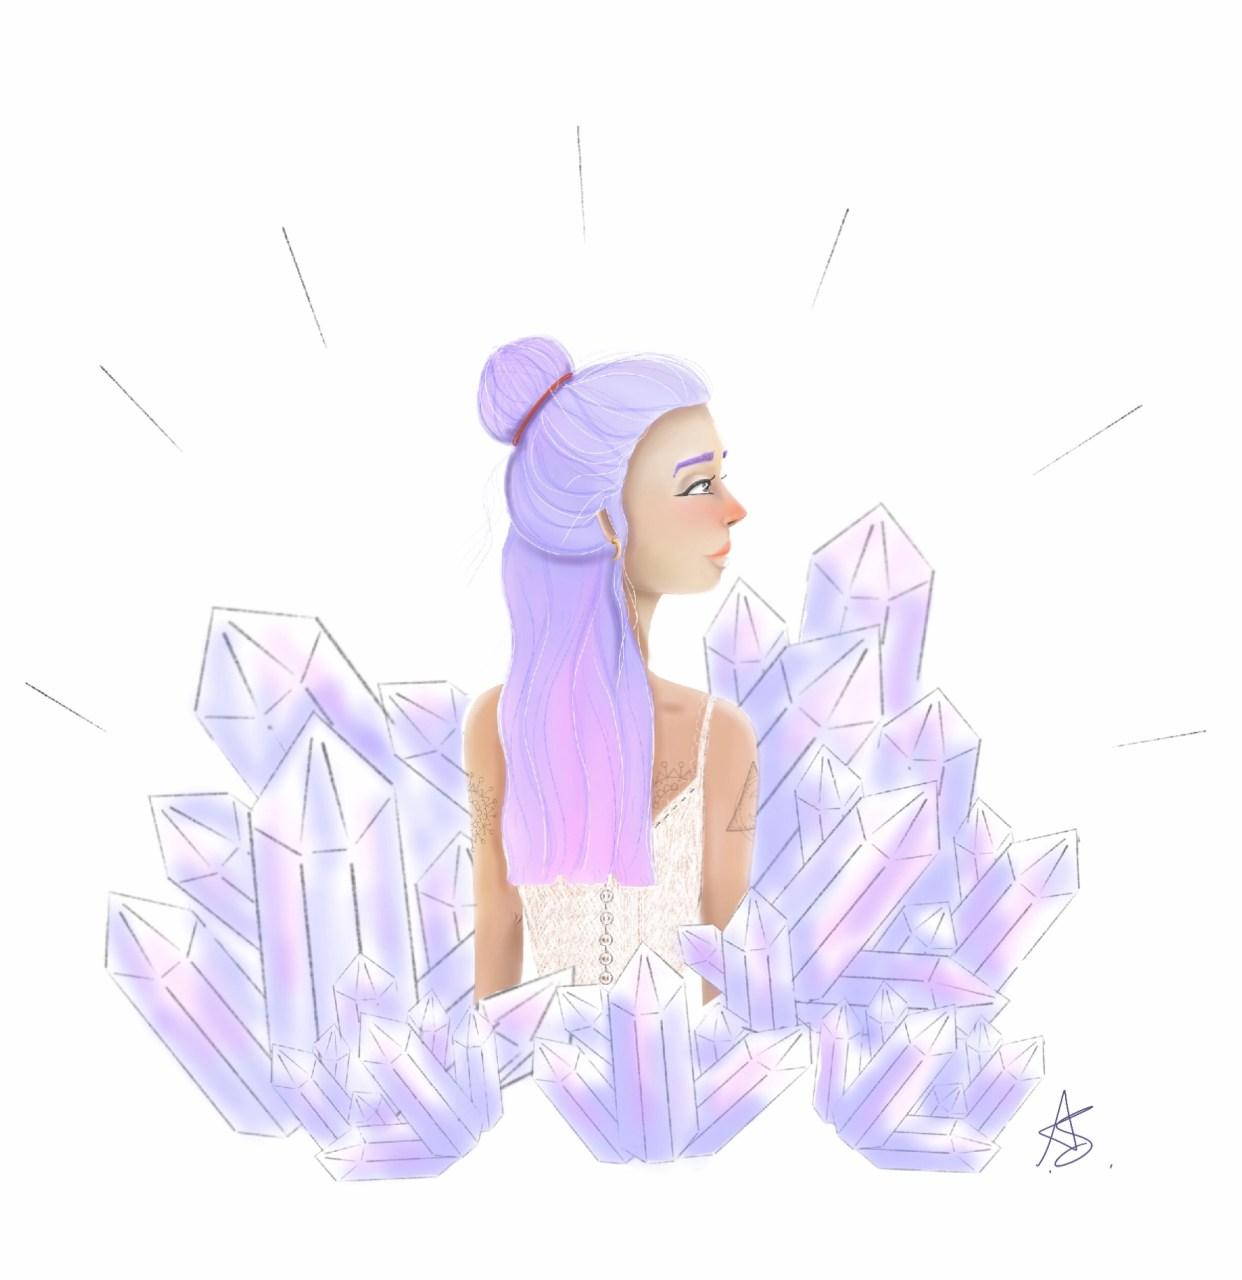 crystals spirituality illustration cornwall illustrator newquay